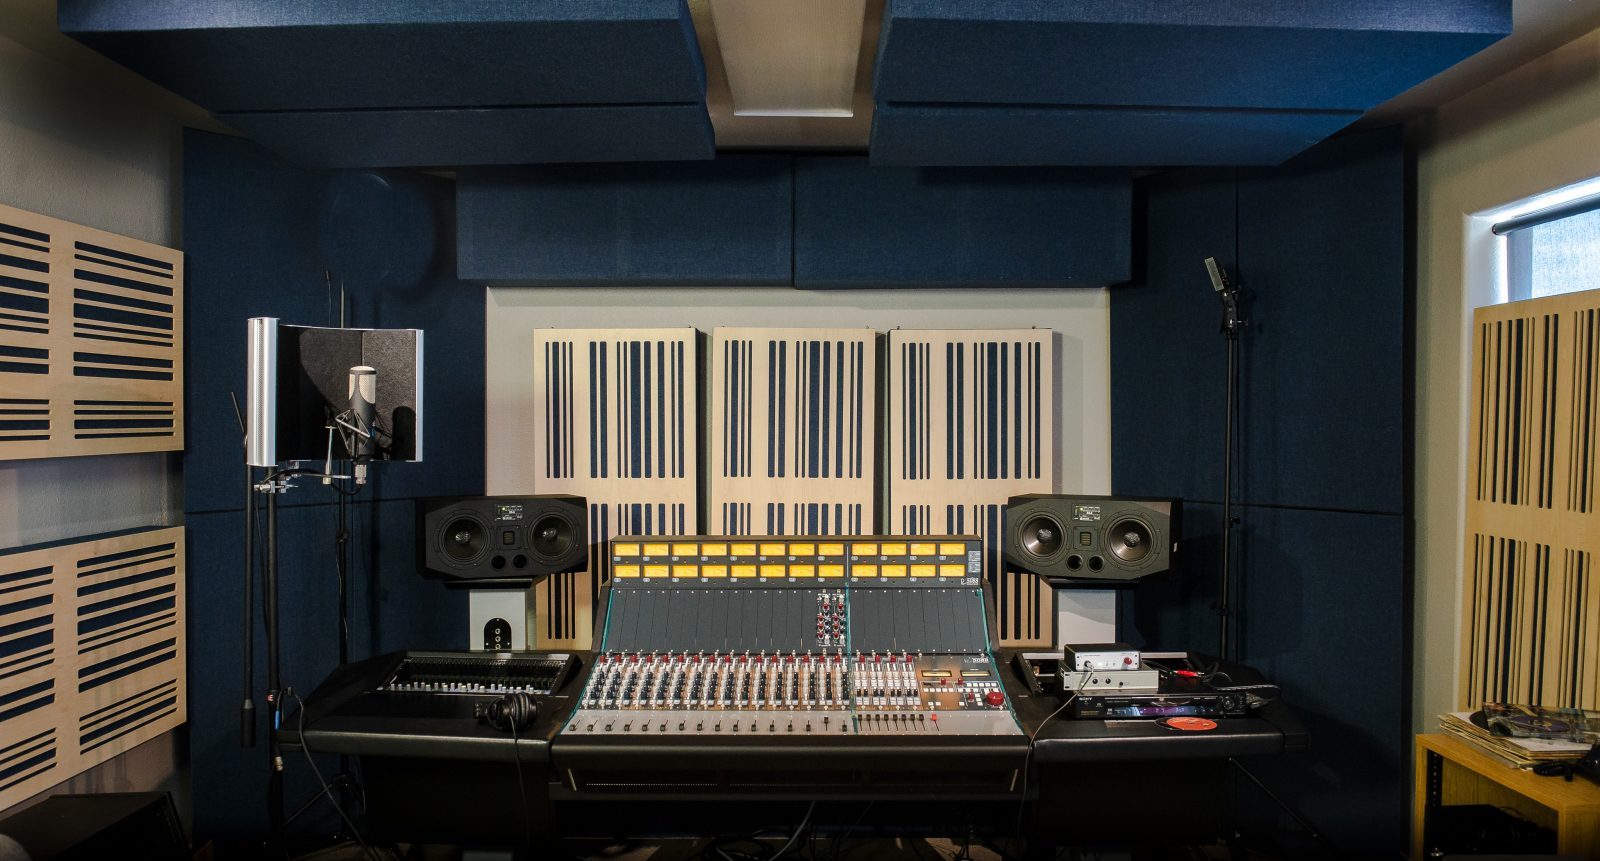 GIK-Acoustics-recording studio acoustic treatment panels.jpg